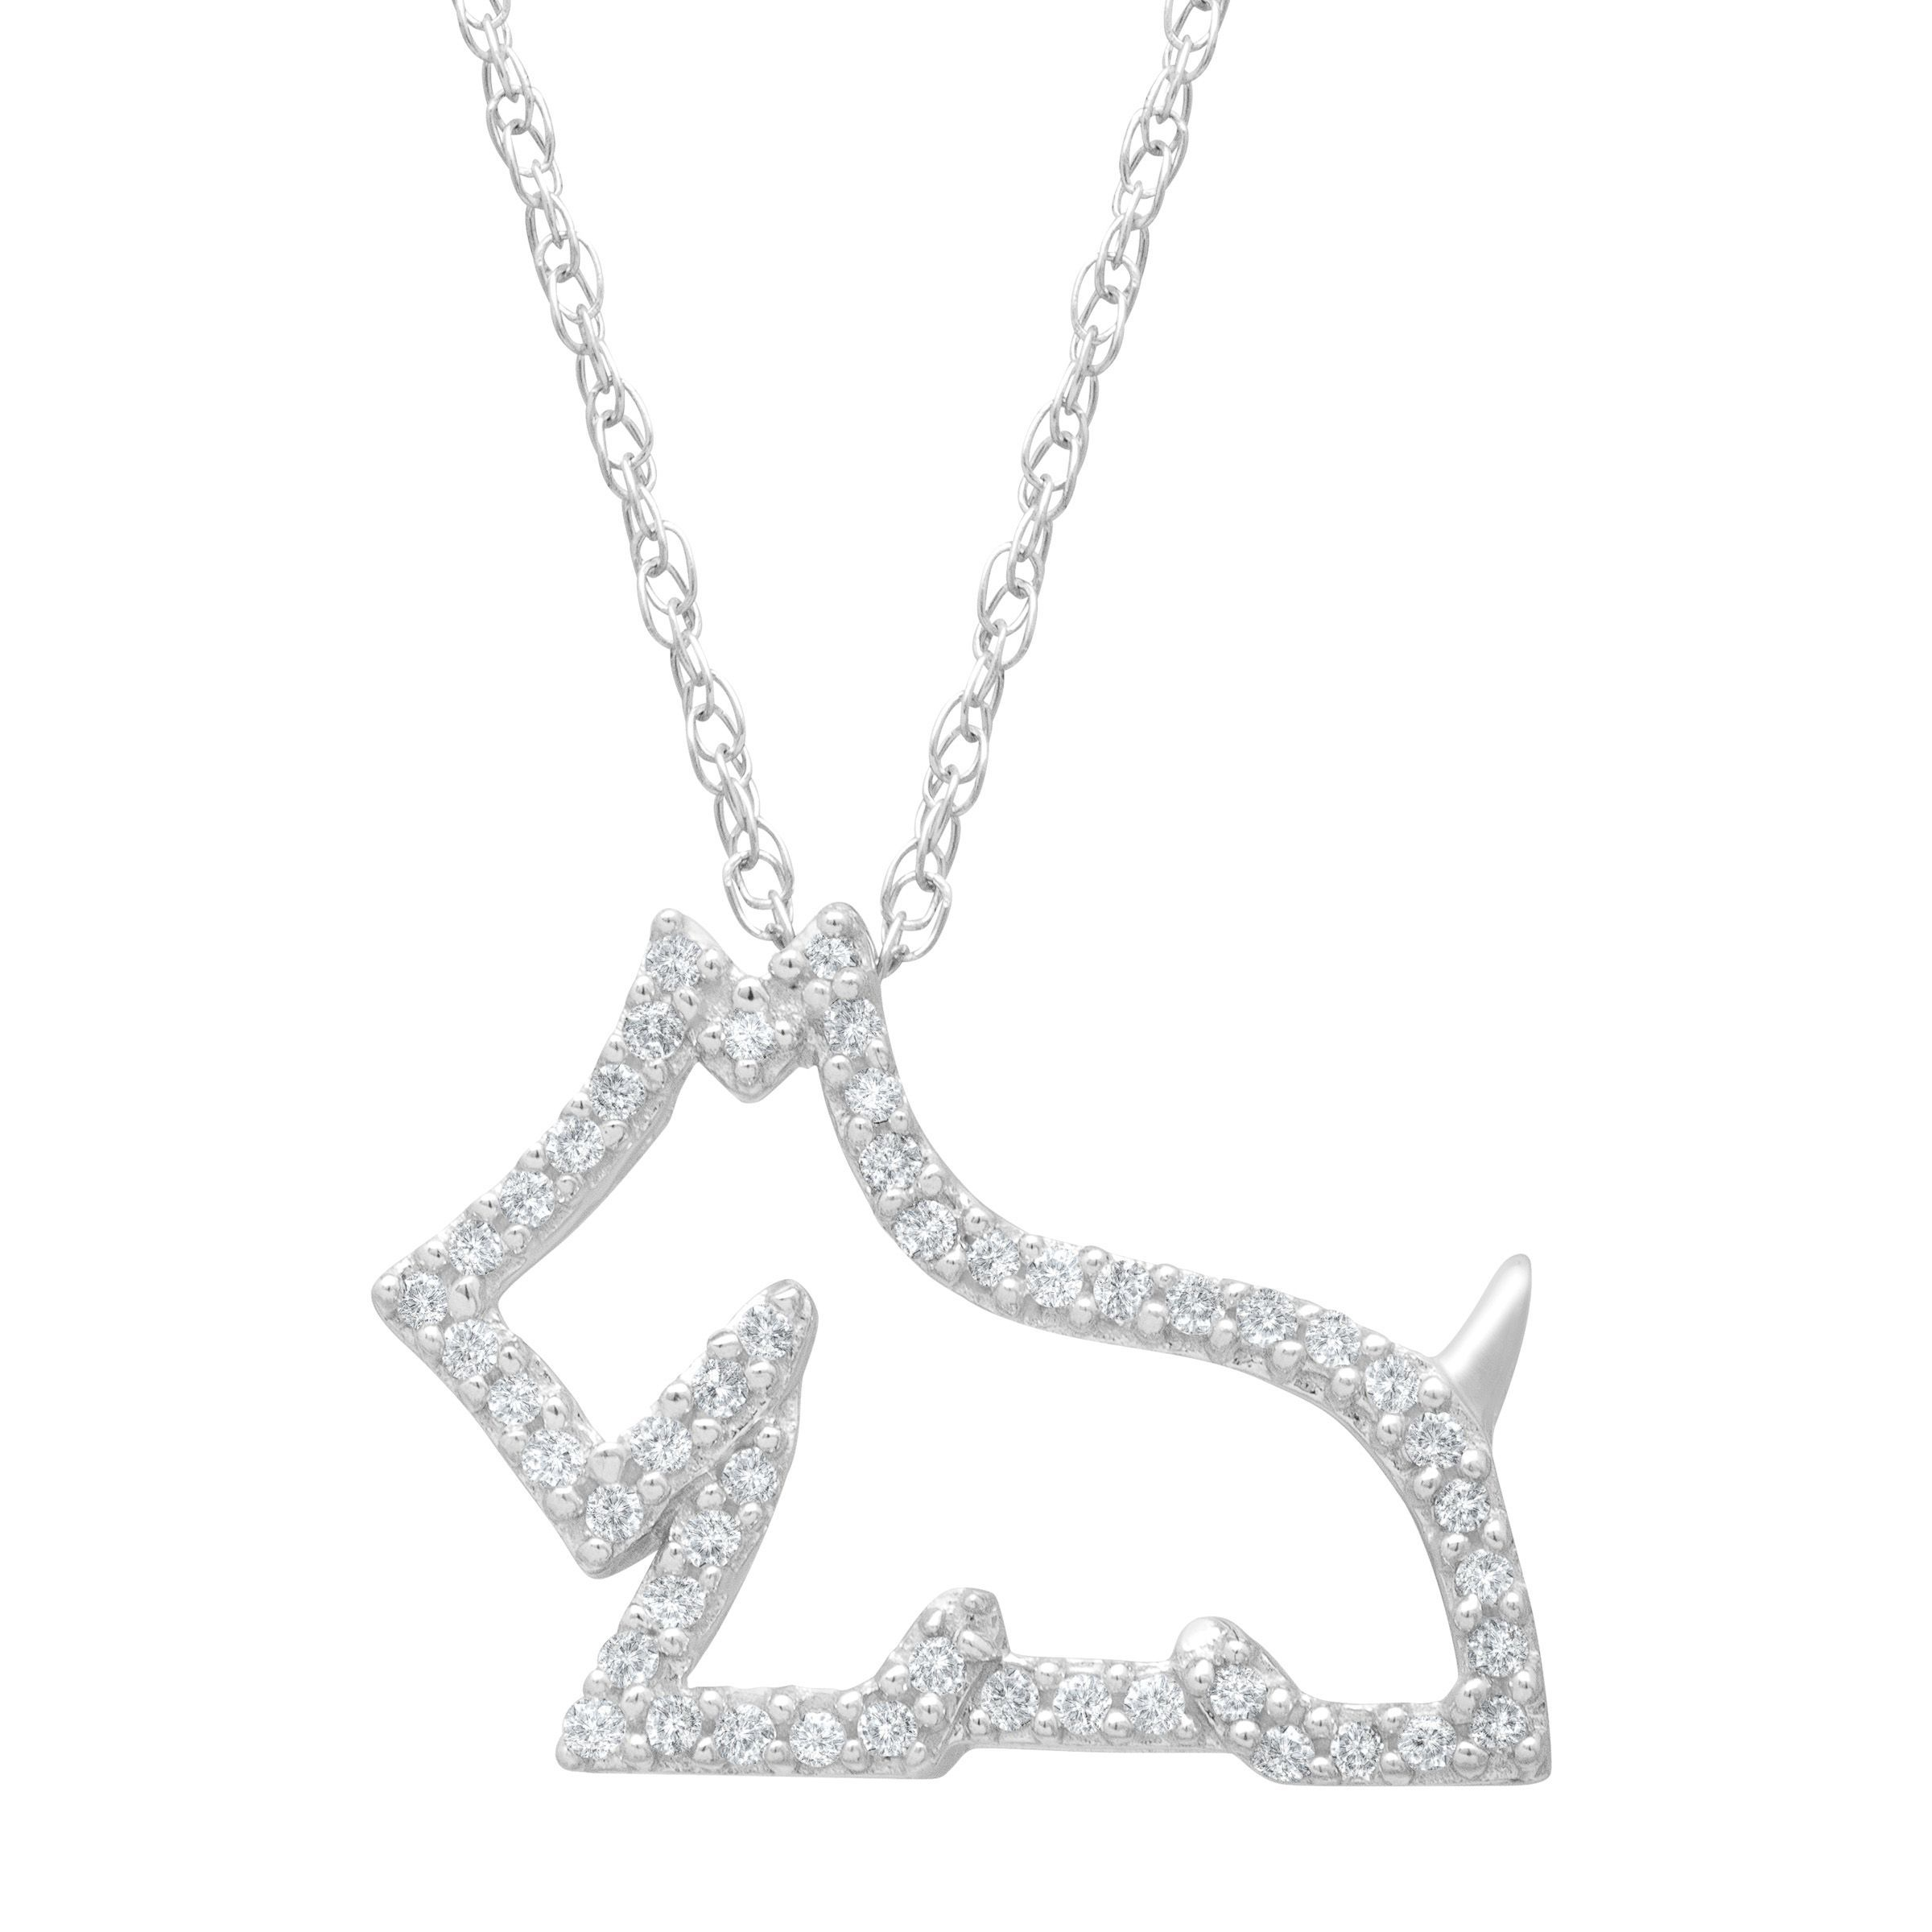 1 8 ct Diamond Scottie Dog Pendant in 14K White Gold